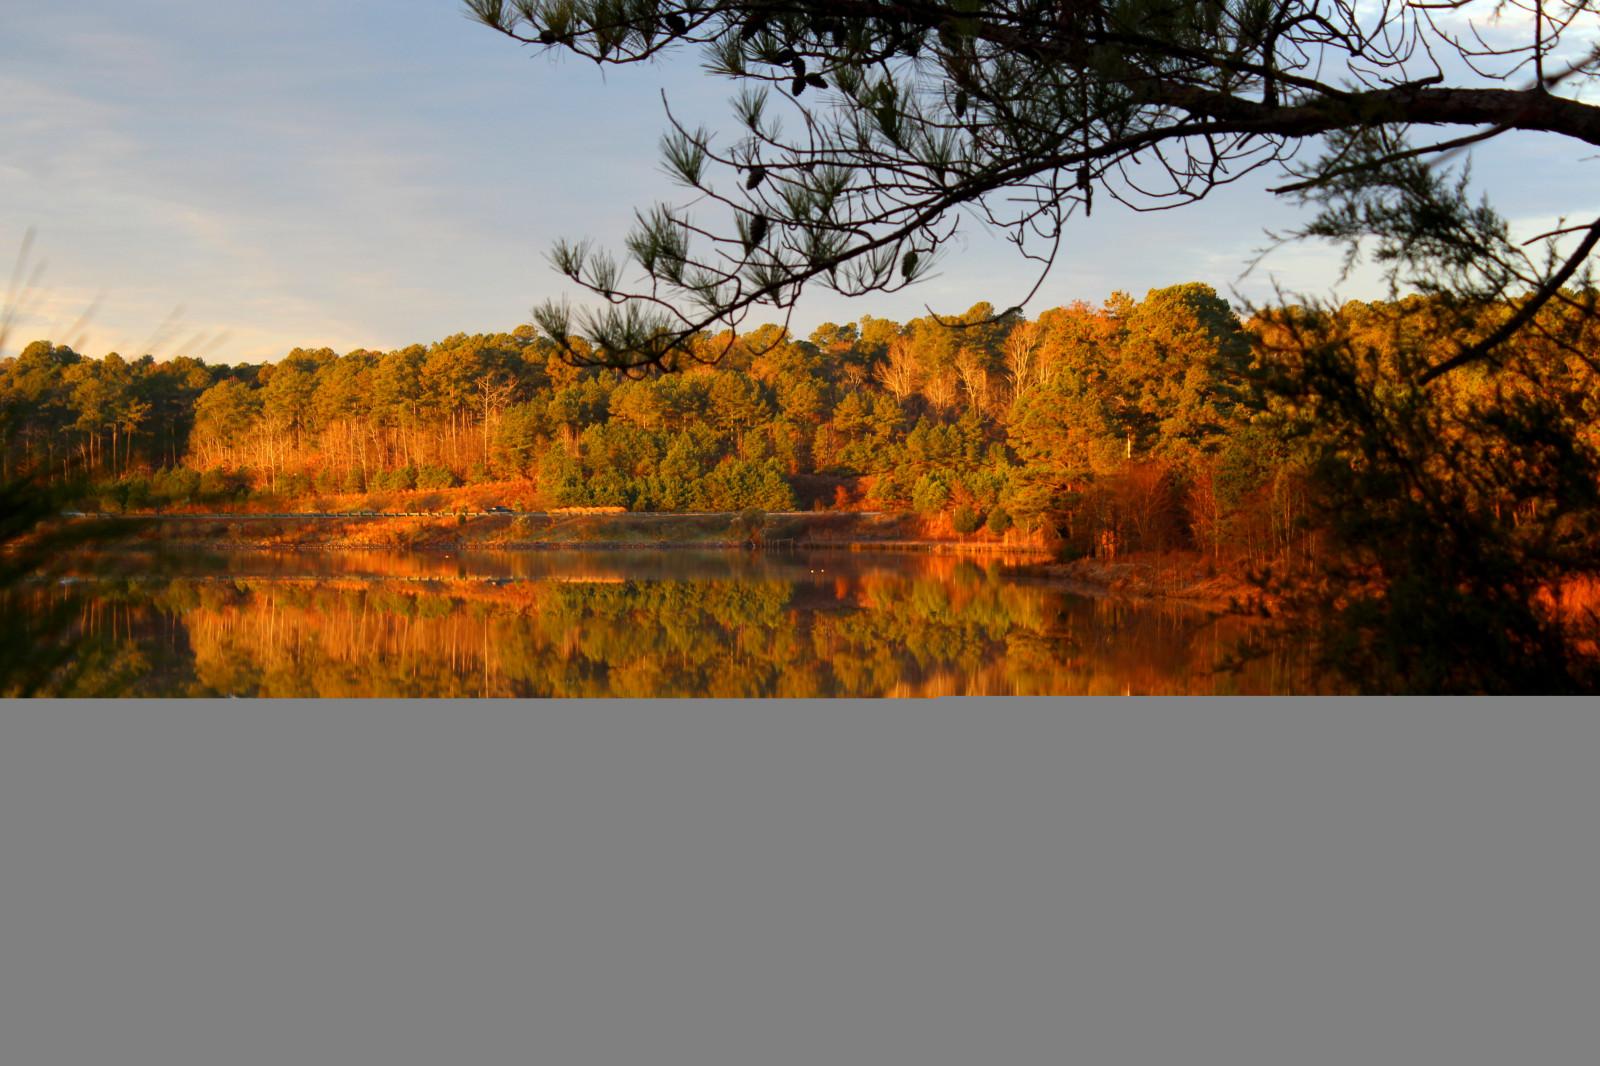 Fondos de pantalla paisaje lago naturaleza reflexi n for Cabina lago north carolina